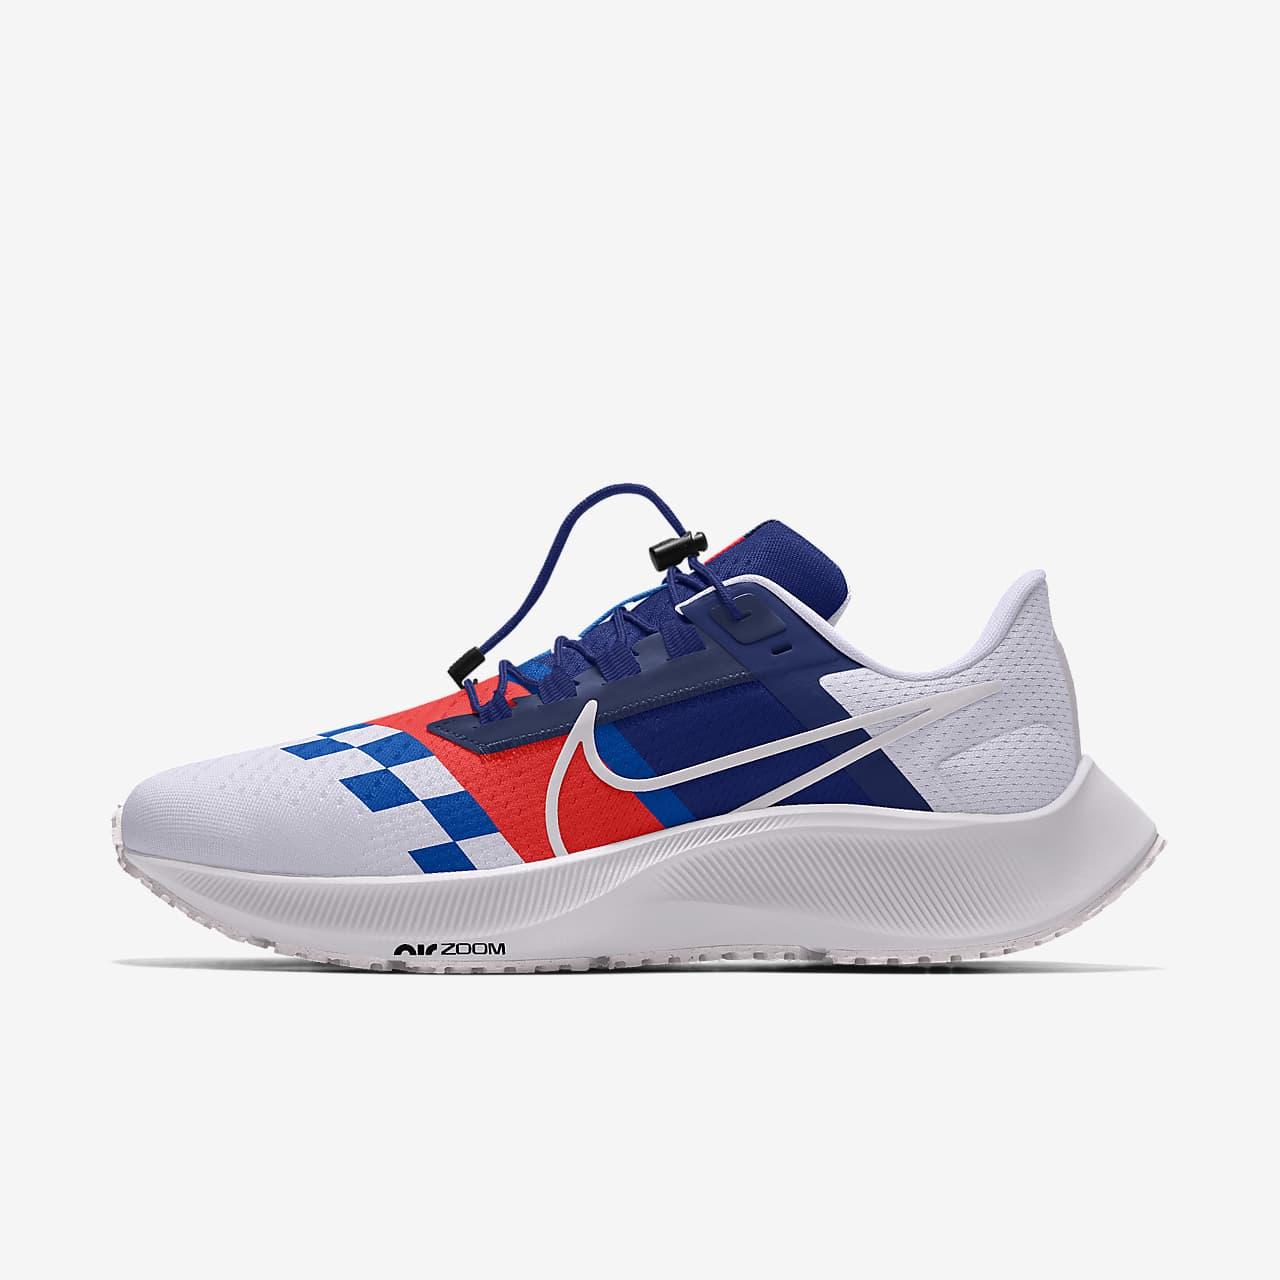 Specialdesignad löparsko Nike Air Zoom Pegasus 38 By You för kvinnor